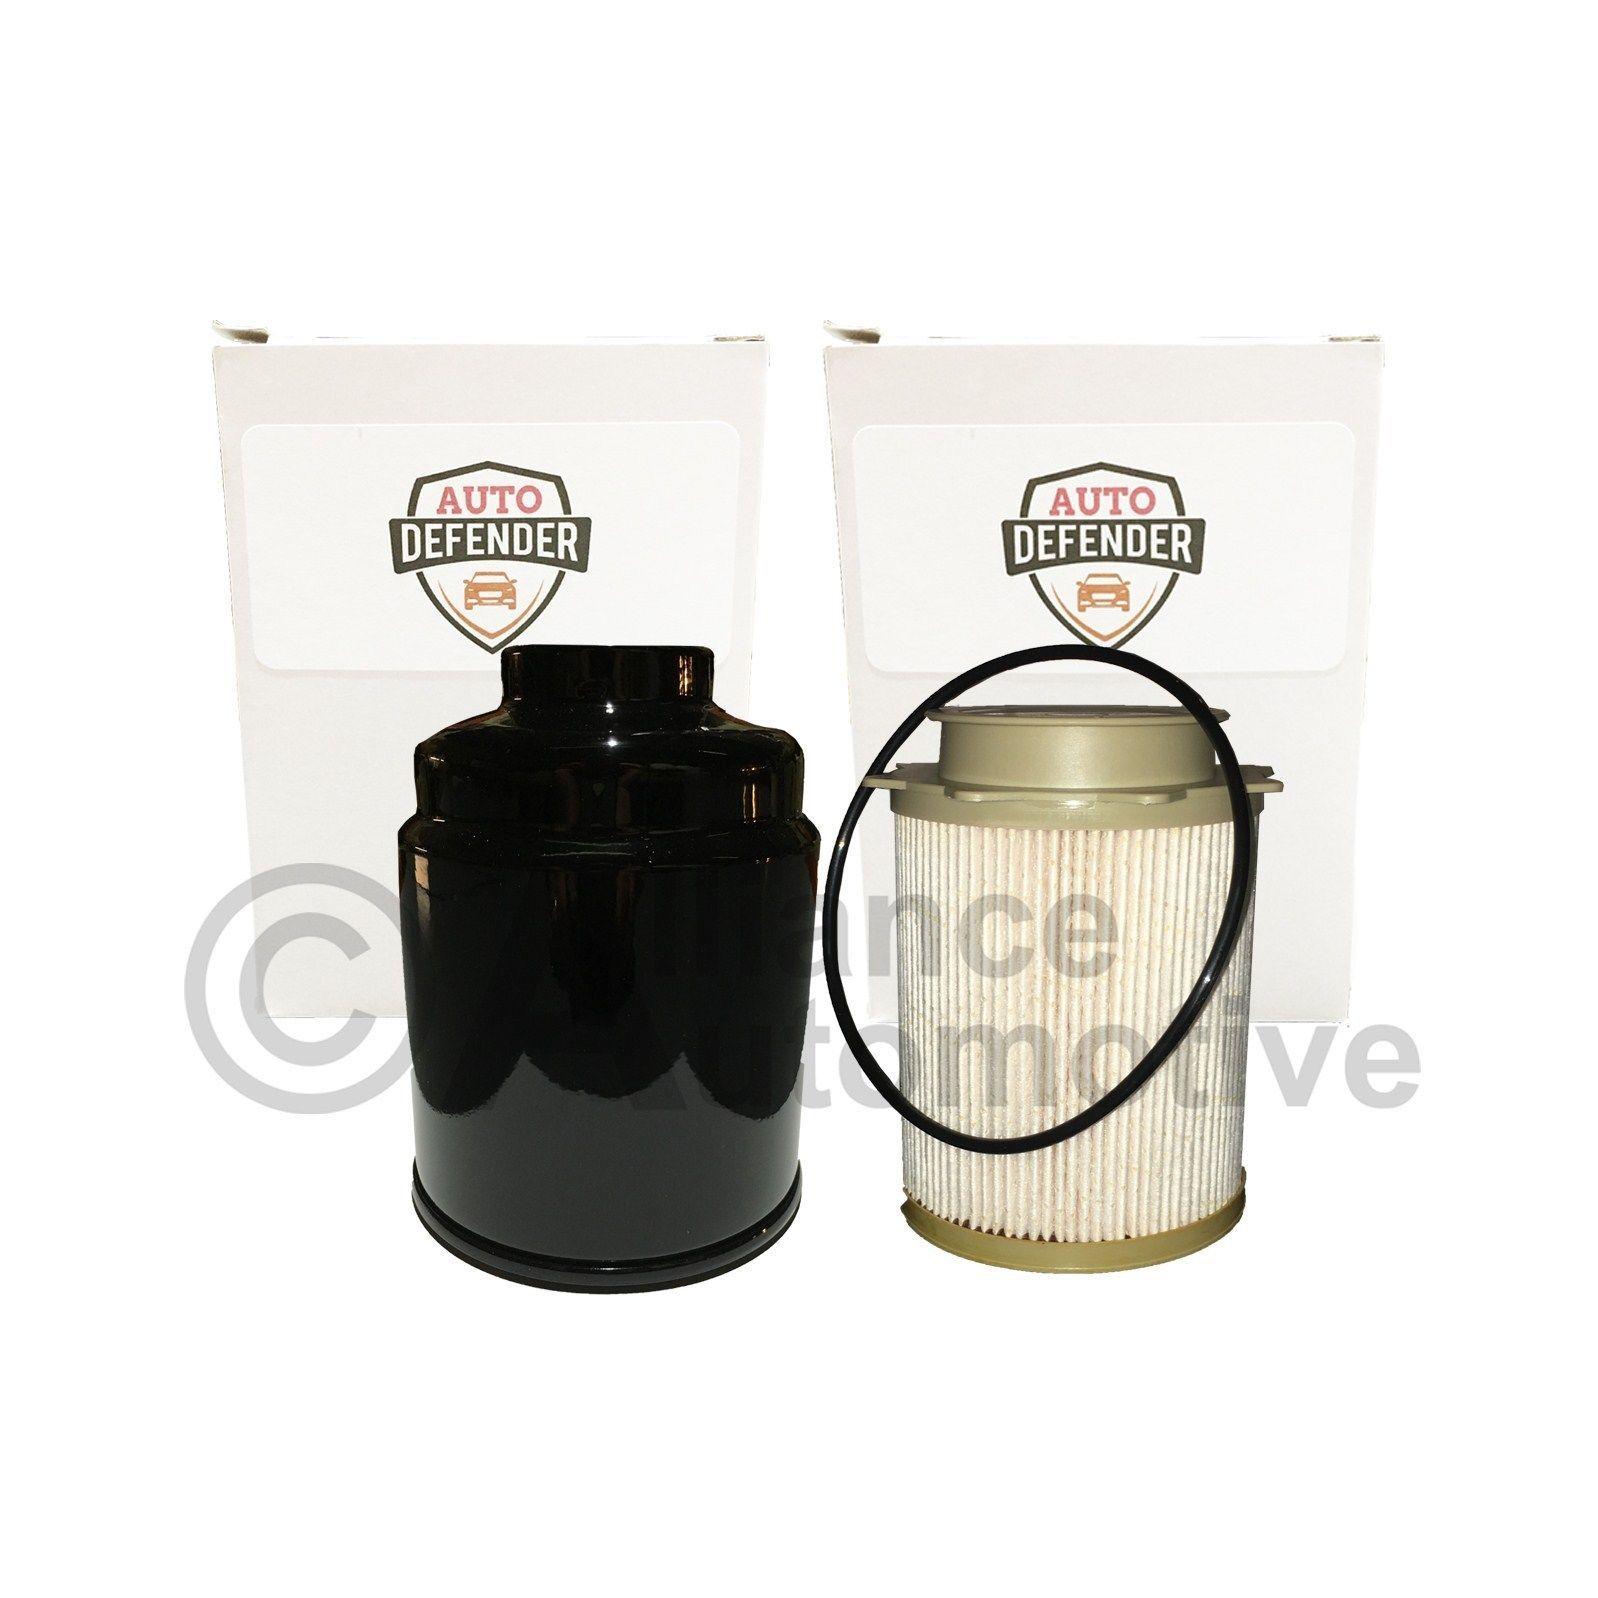 hight resolution of dodge ram 6 7l fuel filter kit for 2013 2016 cummins diesel front rear filter filter front rear diesel cummins fuel dodge